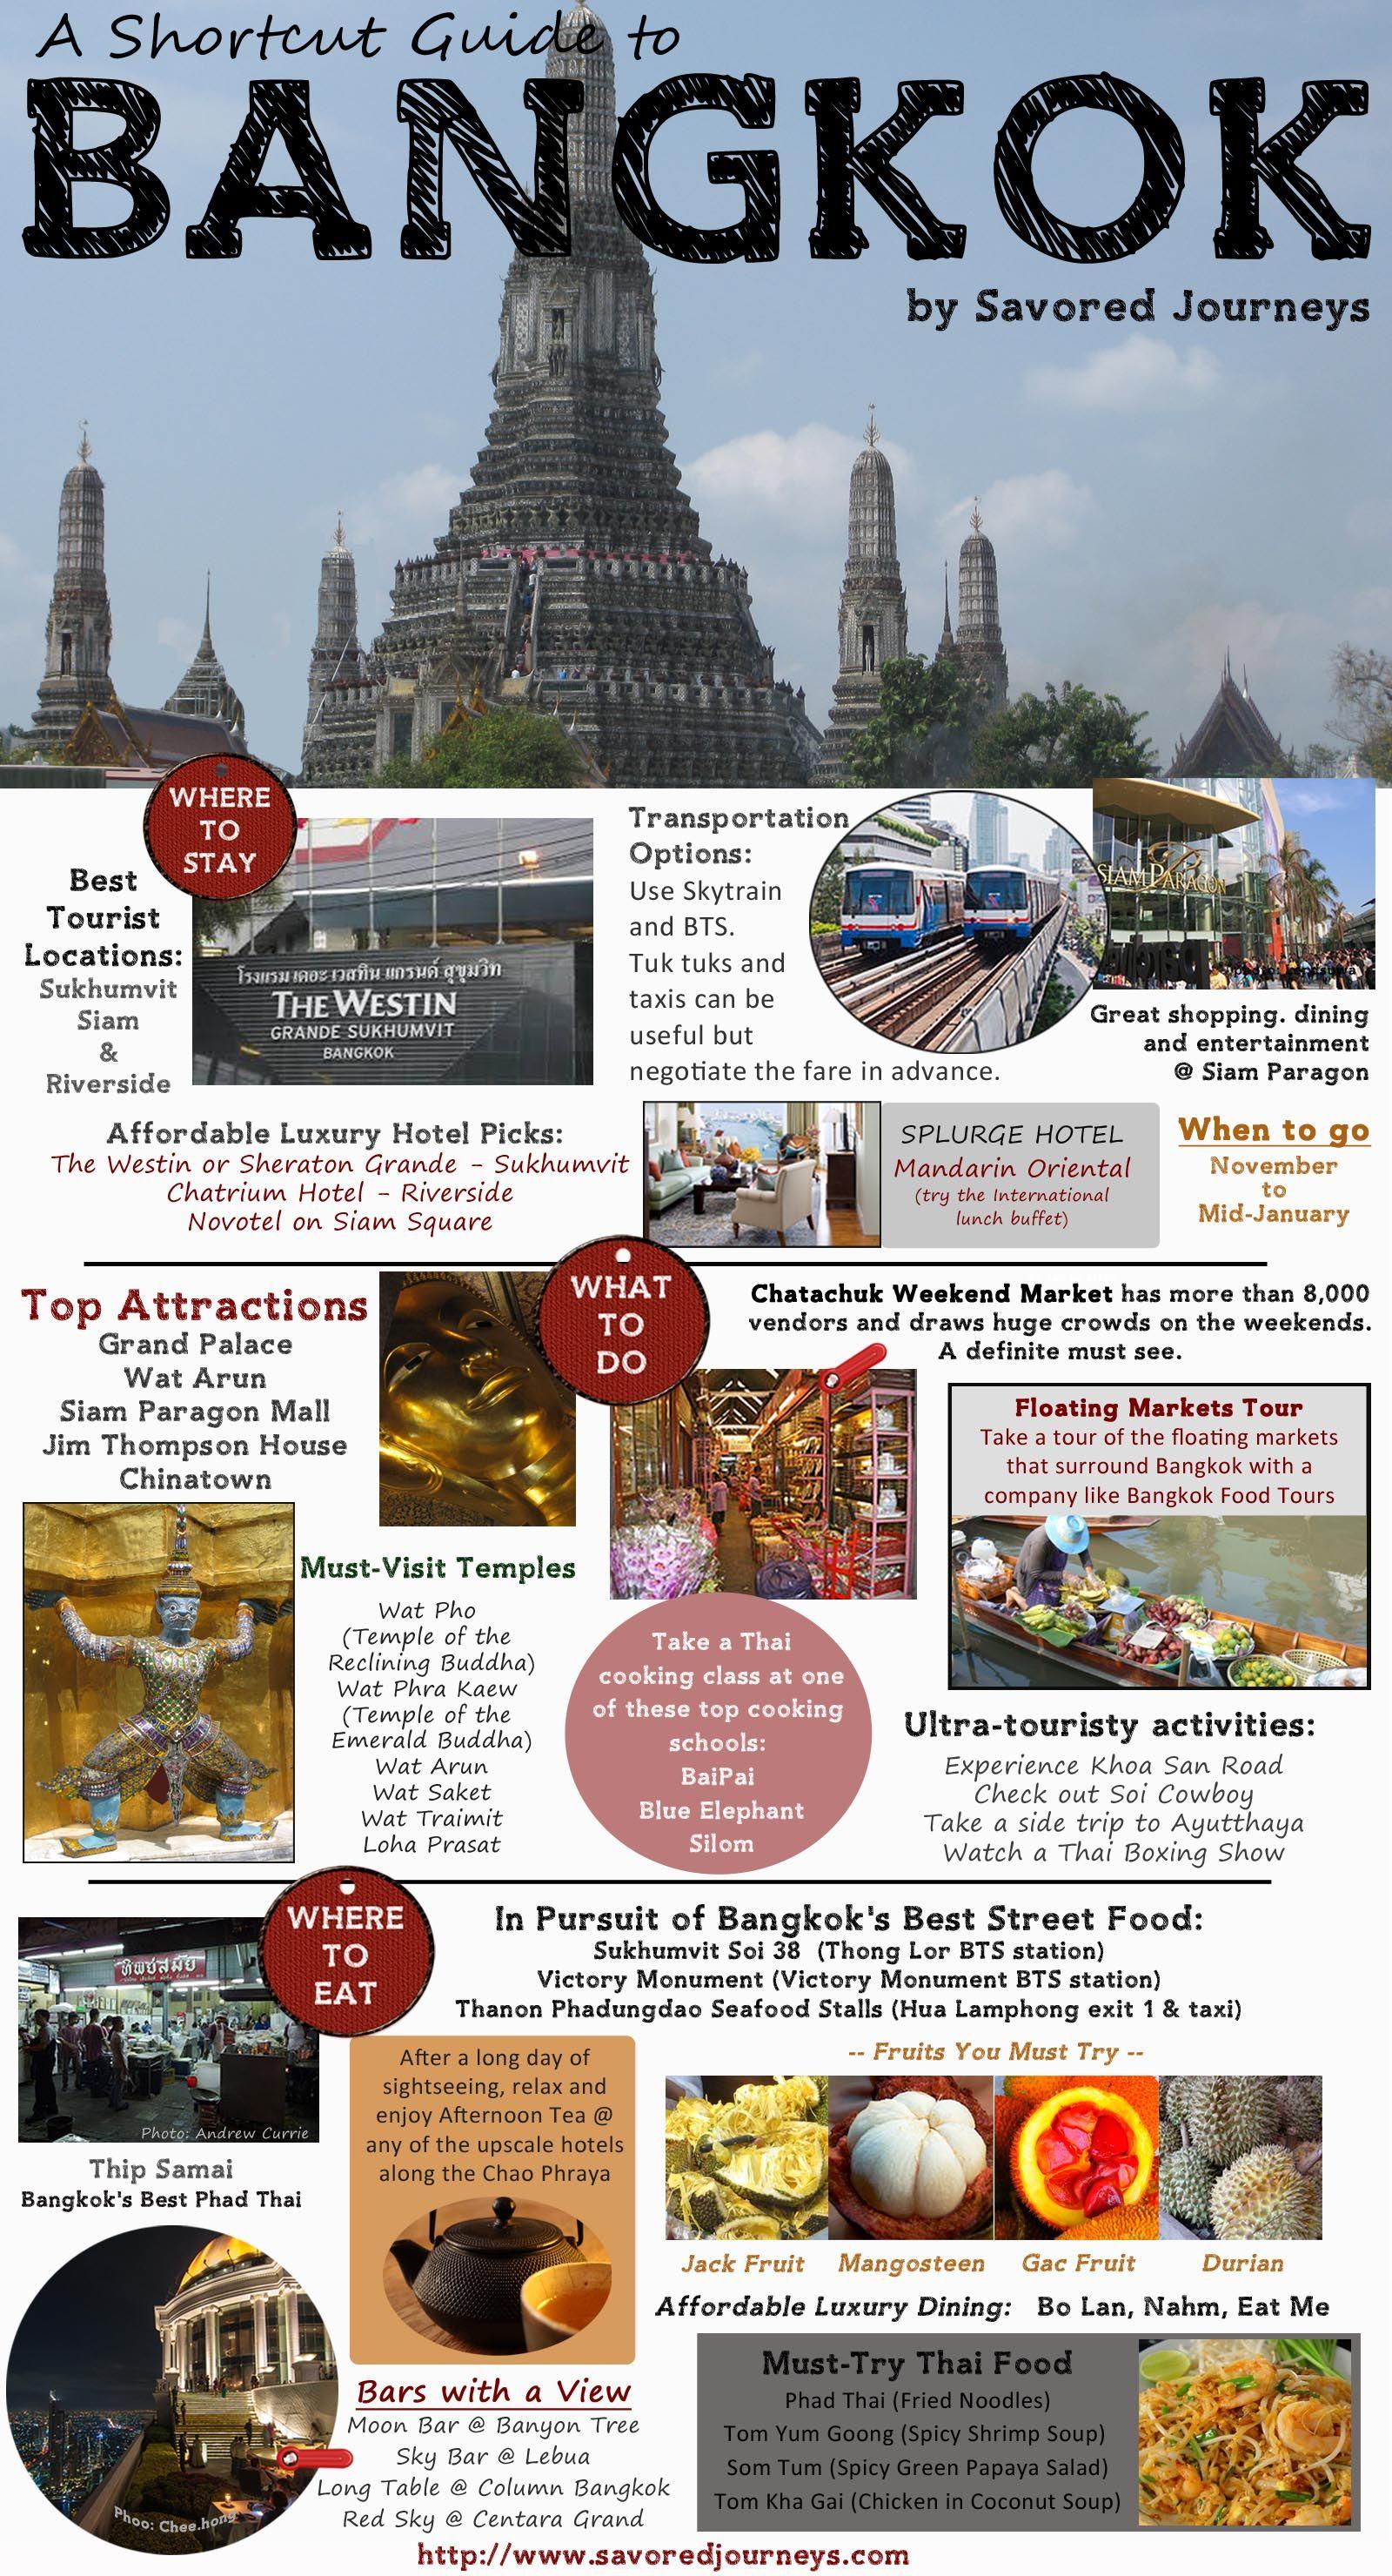 Central thailand travel guide (including bangkok): culture.